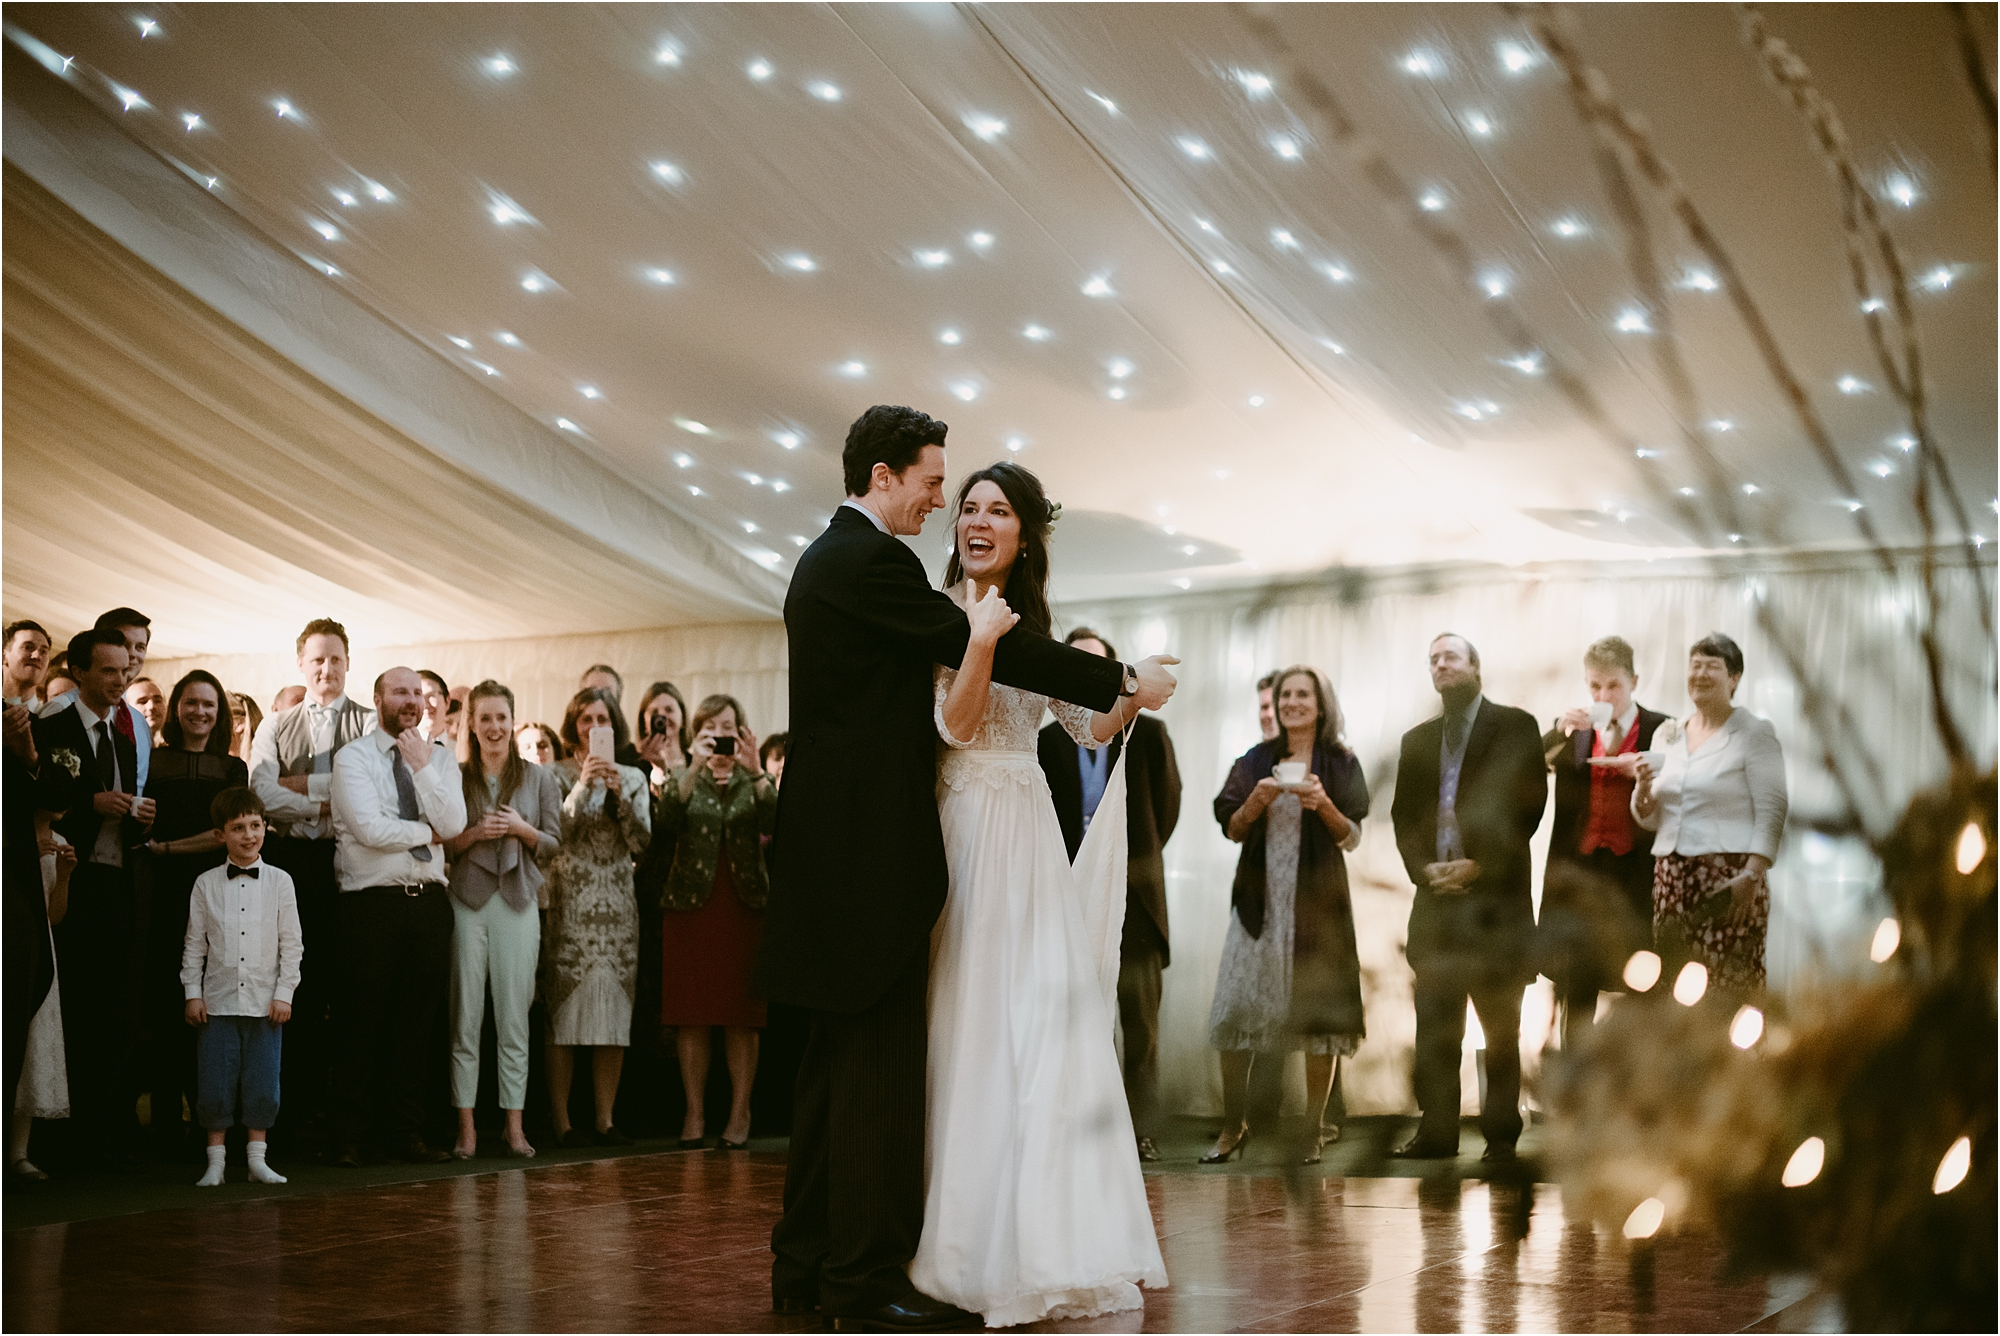 Rose+Harry-outdoor-english-wedding-photography__0116.jpg